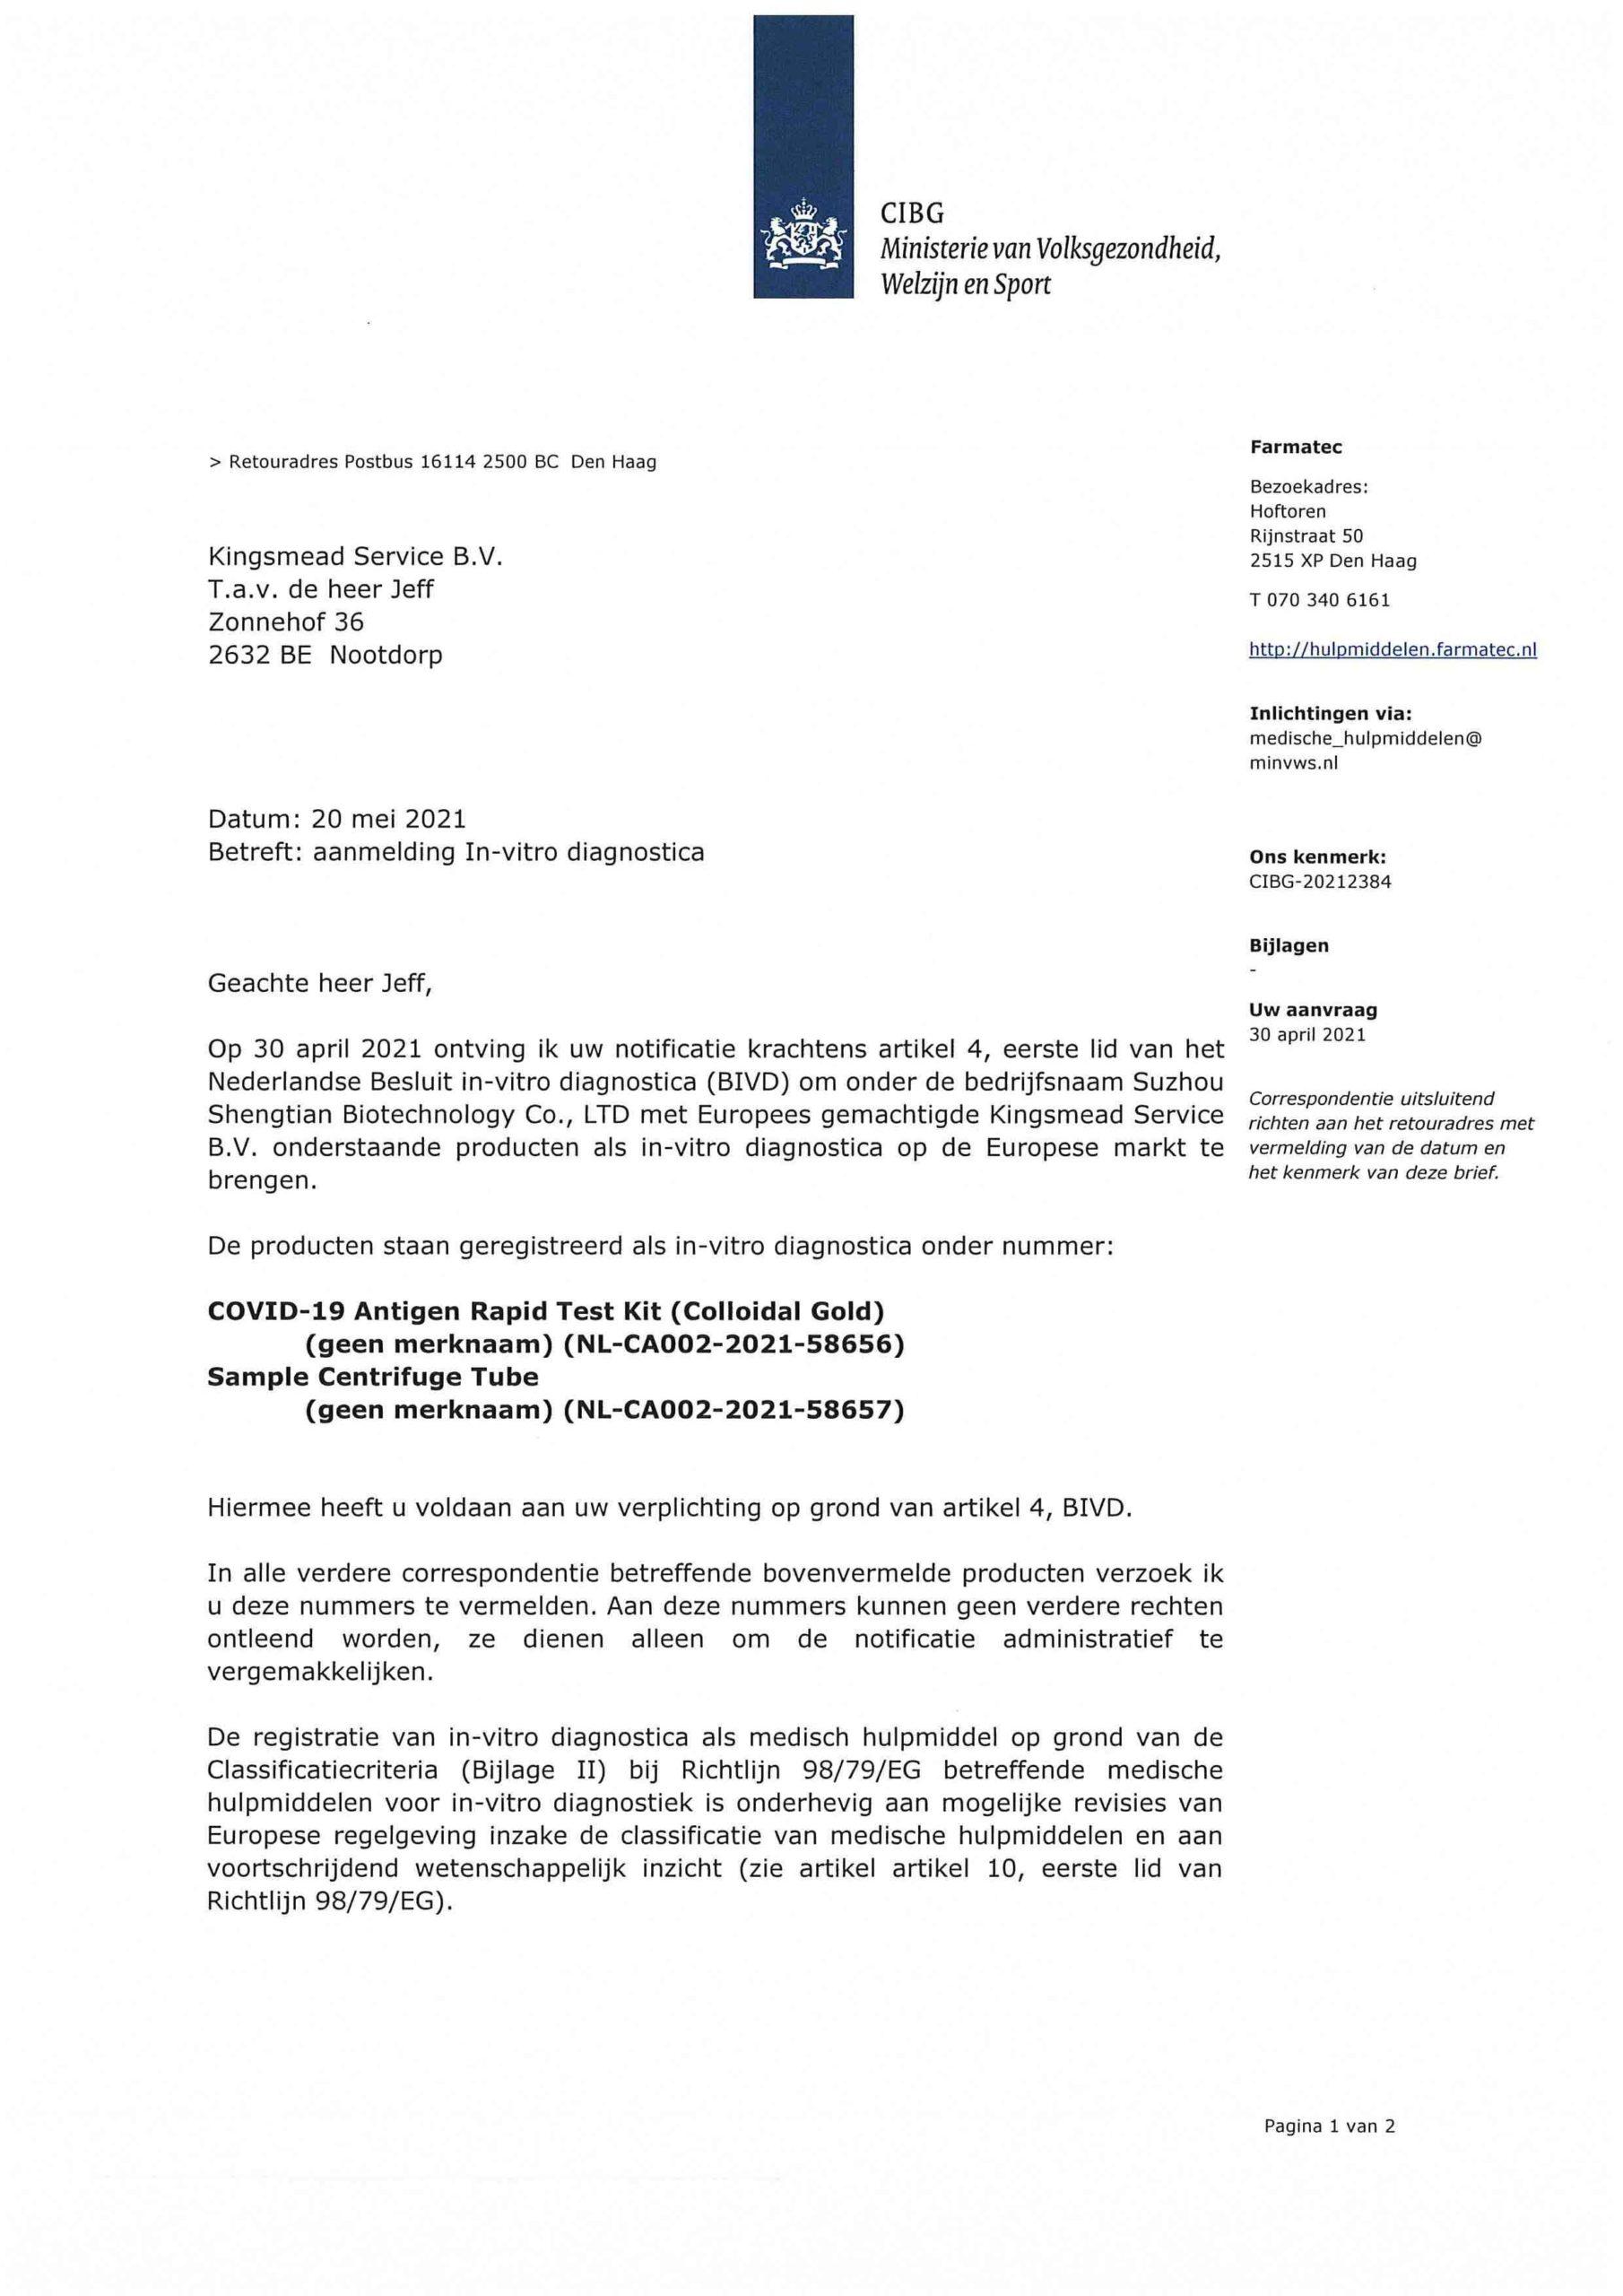 CIBG - St Bio Rapid Test Certificate